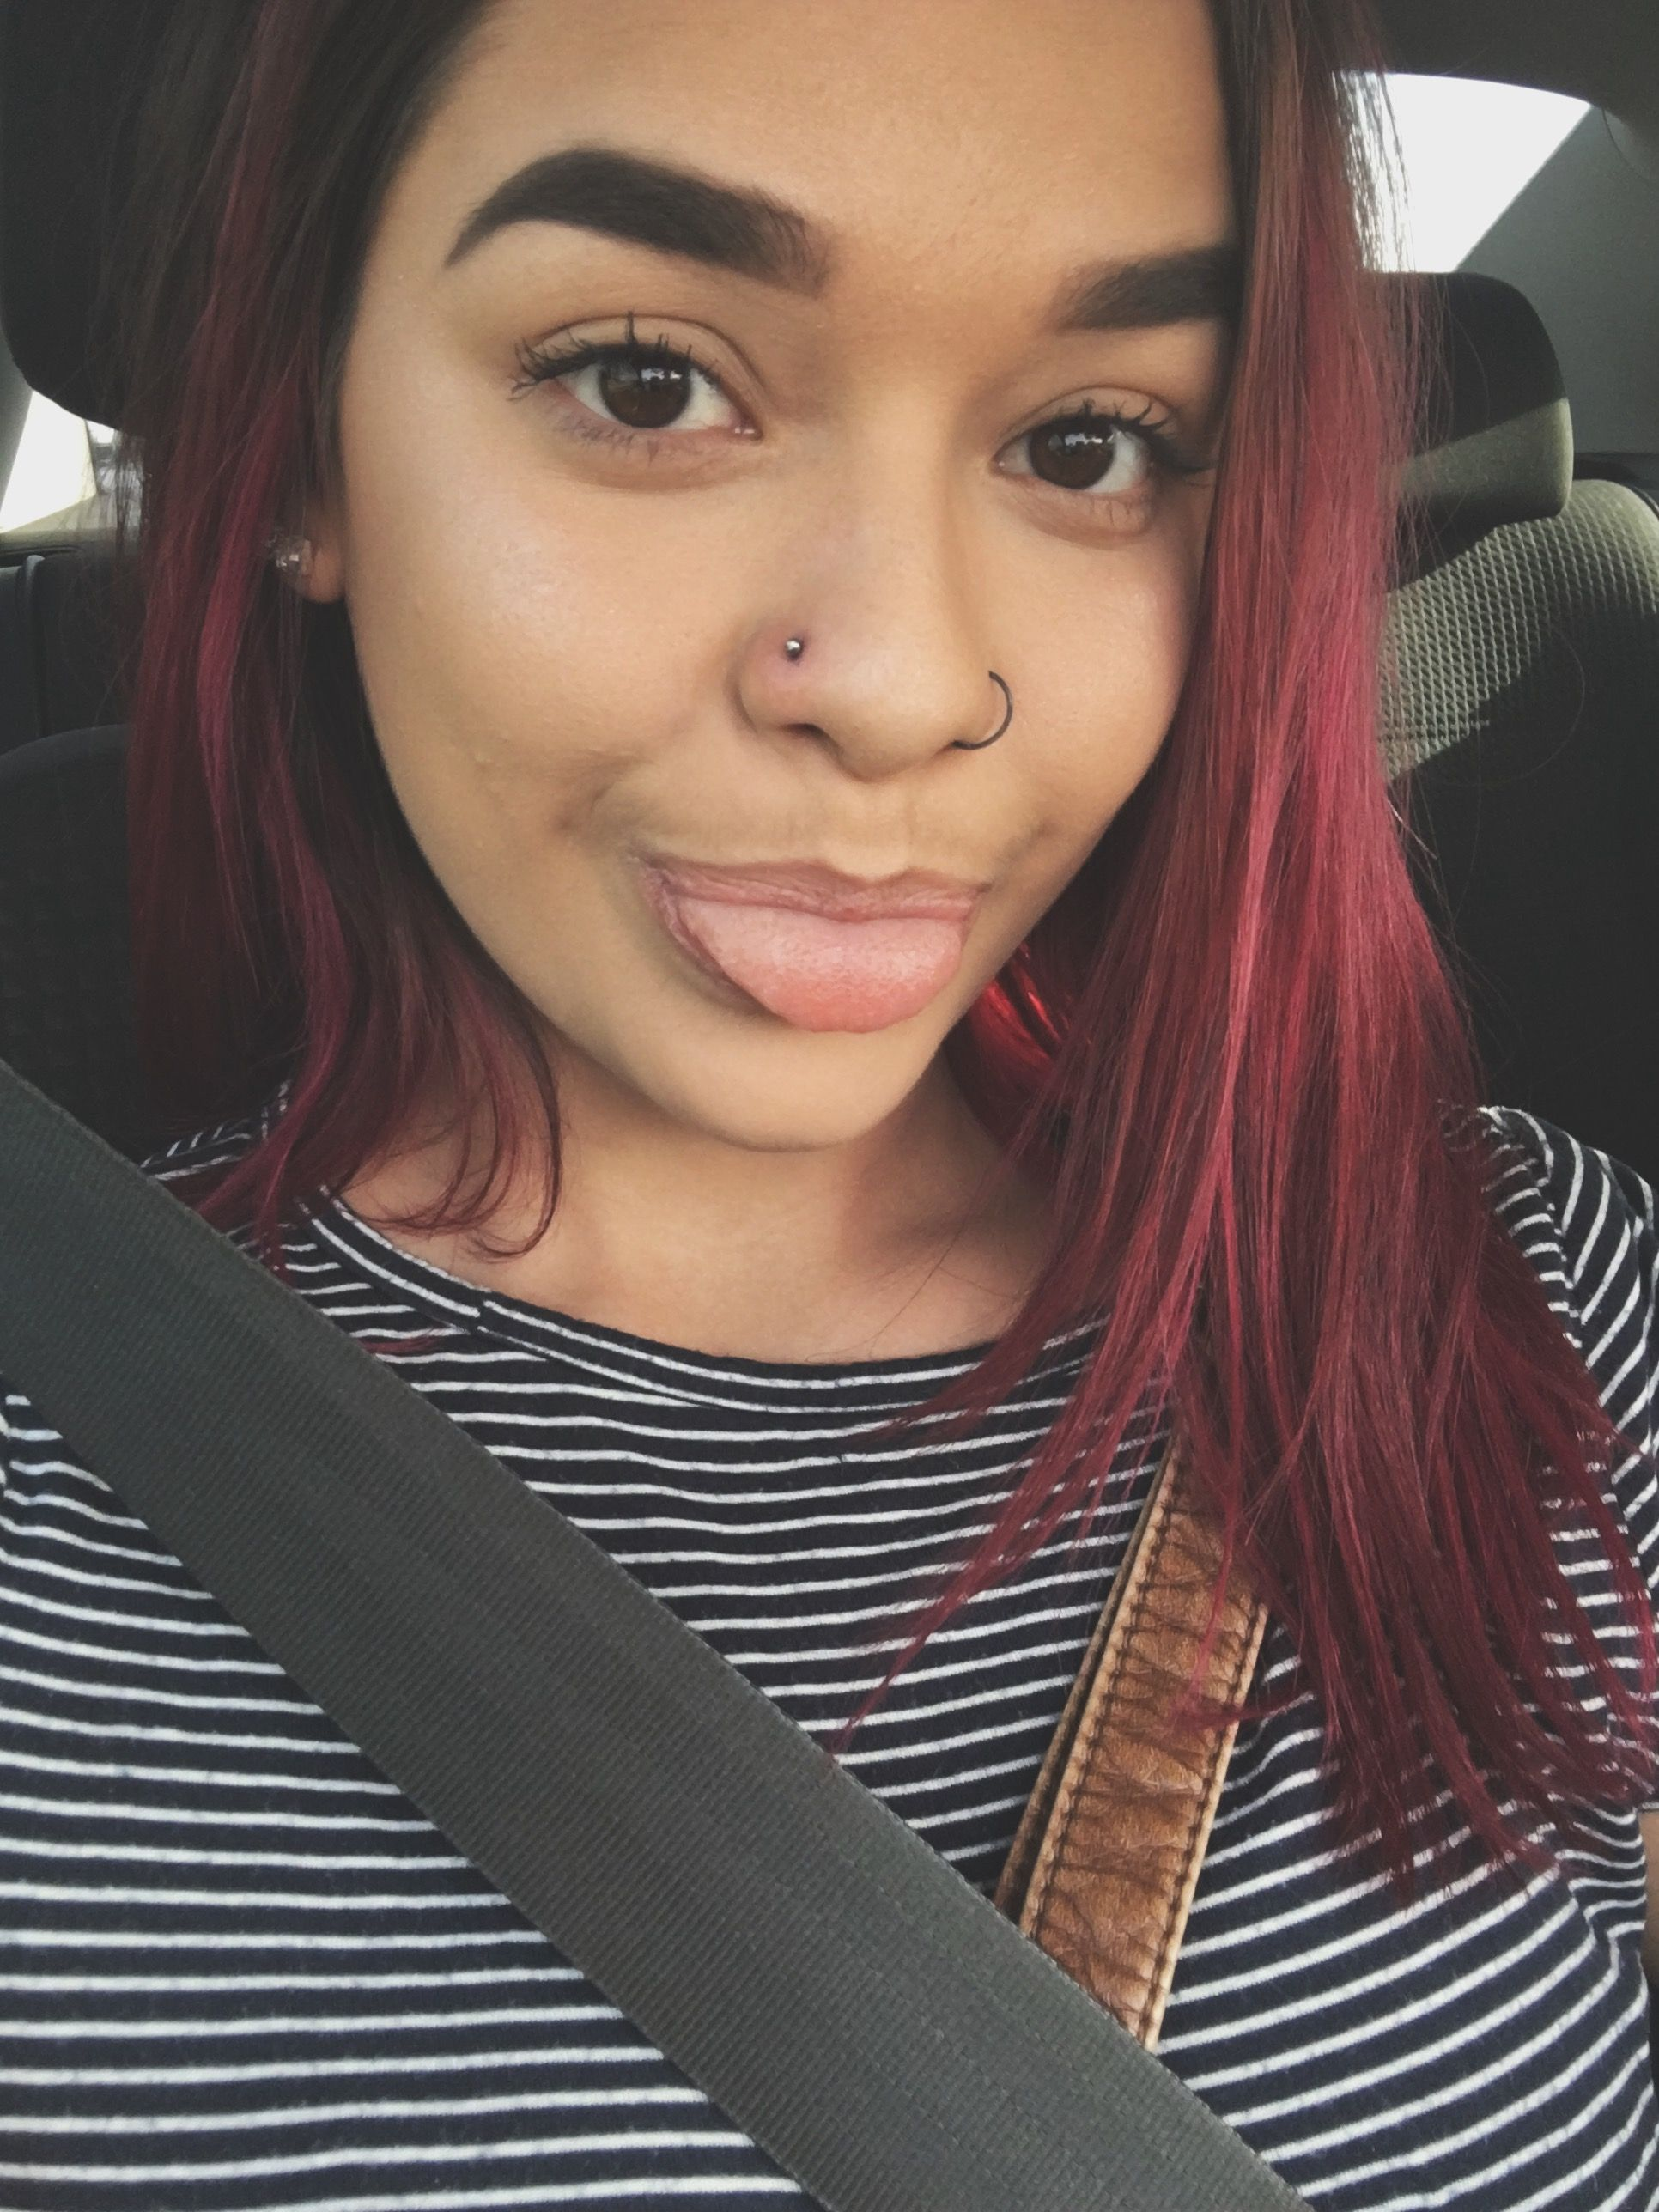 Double nose piercing  piercings  Pinterest  Double nose piercing